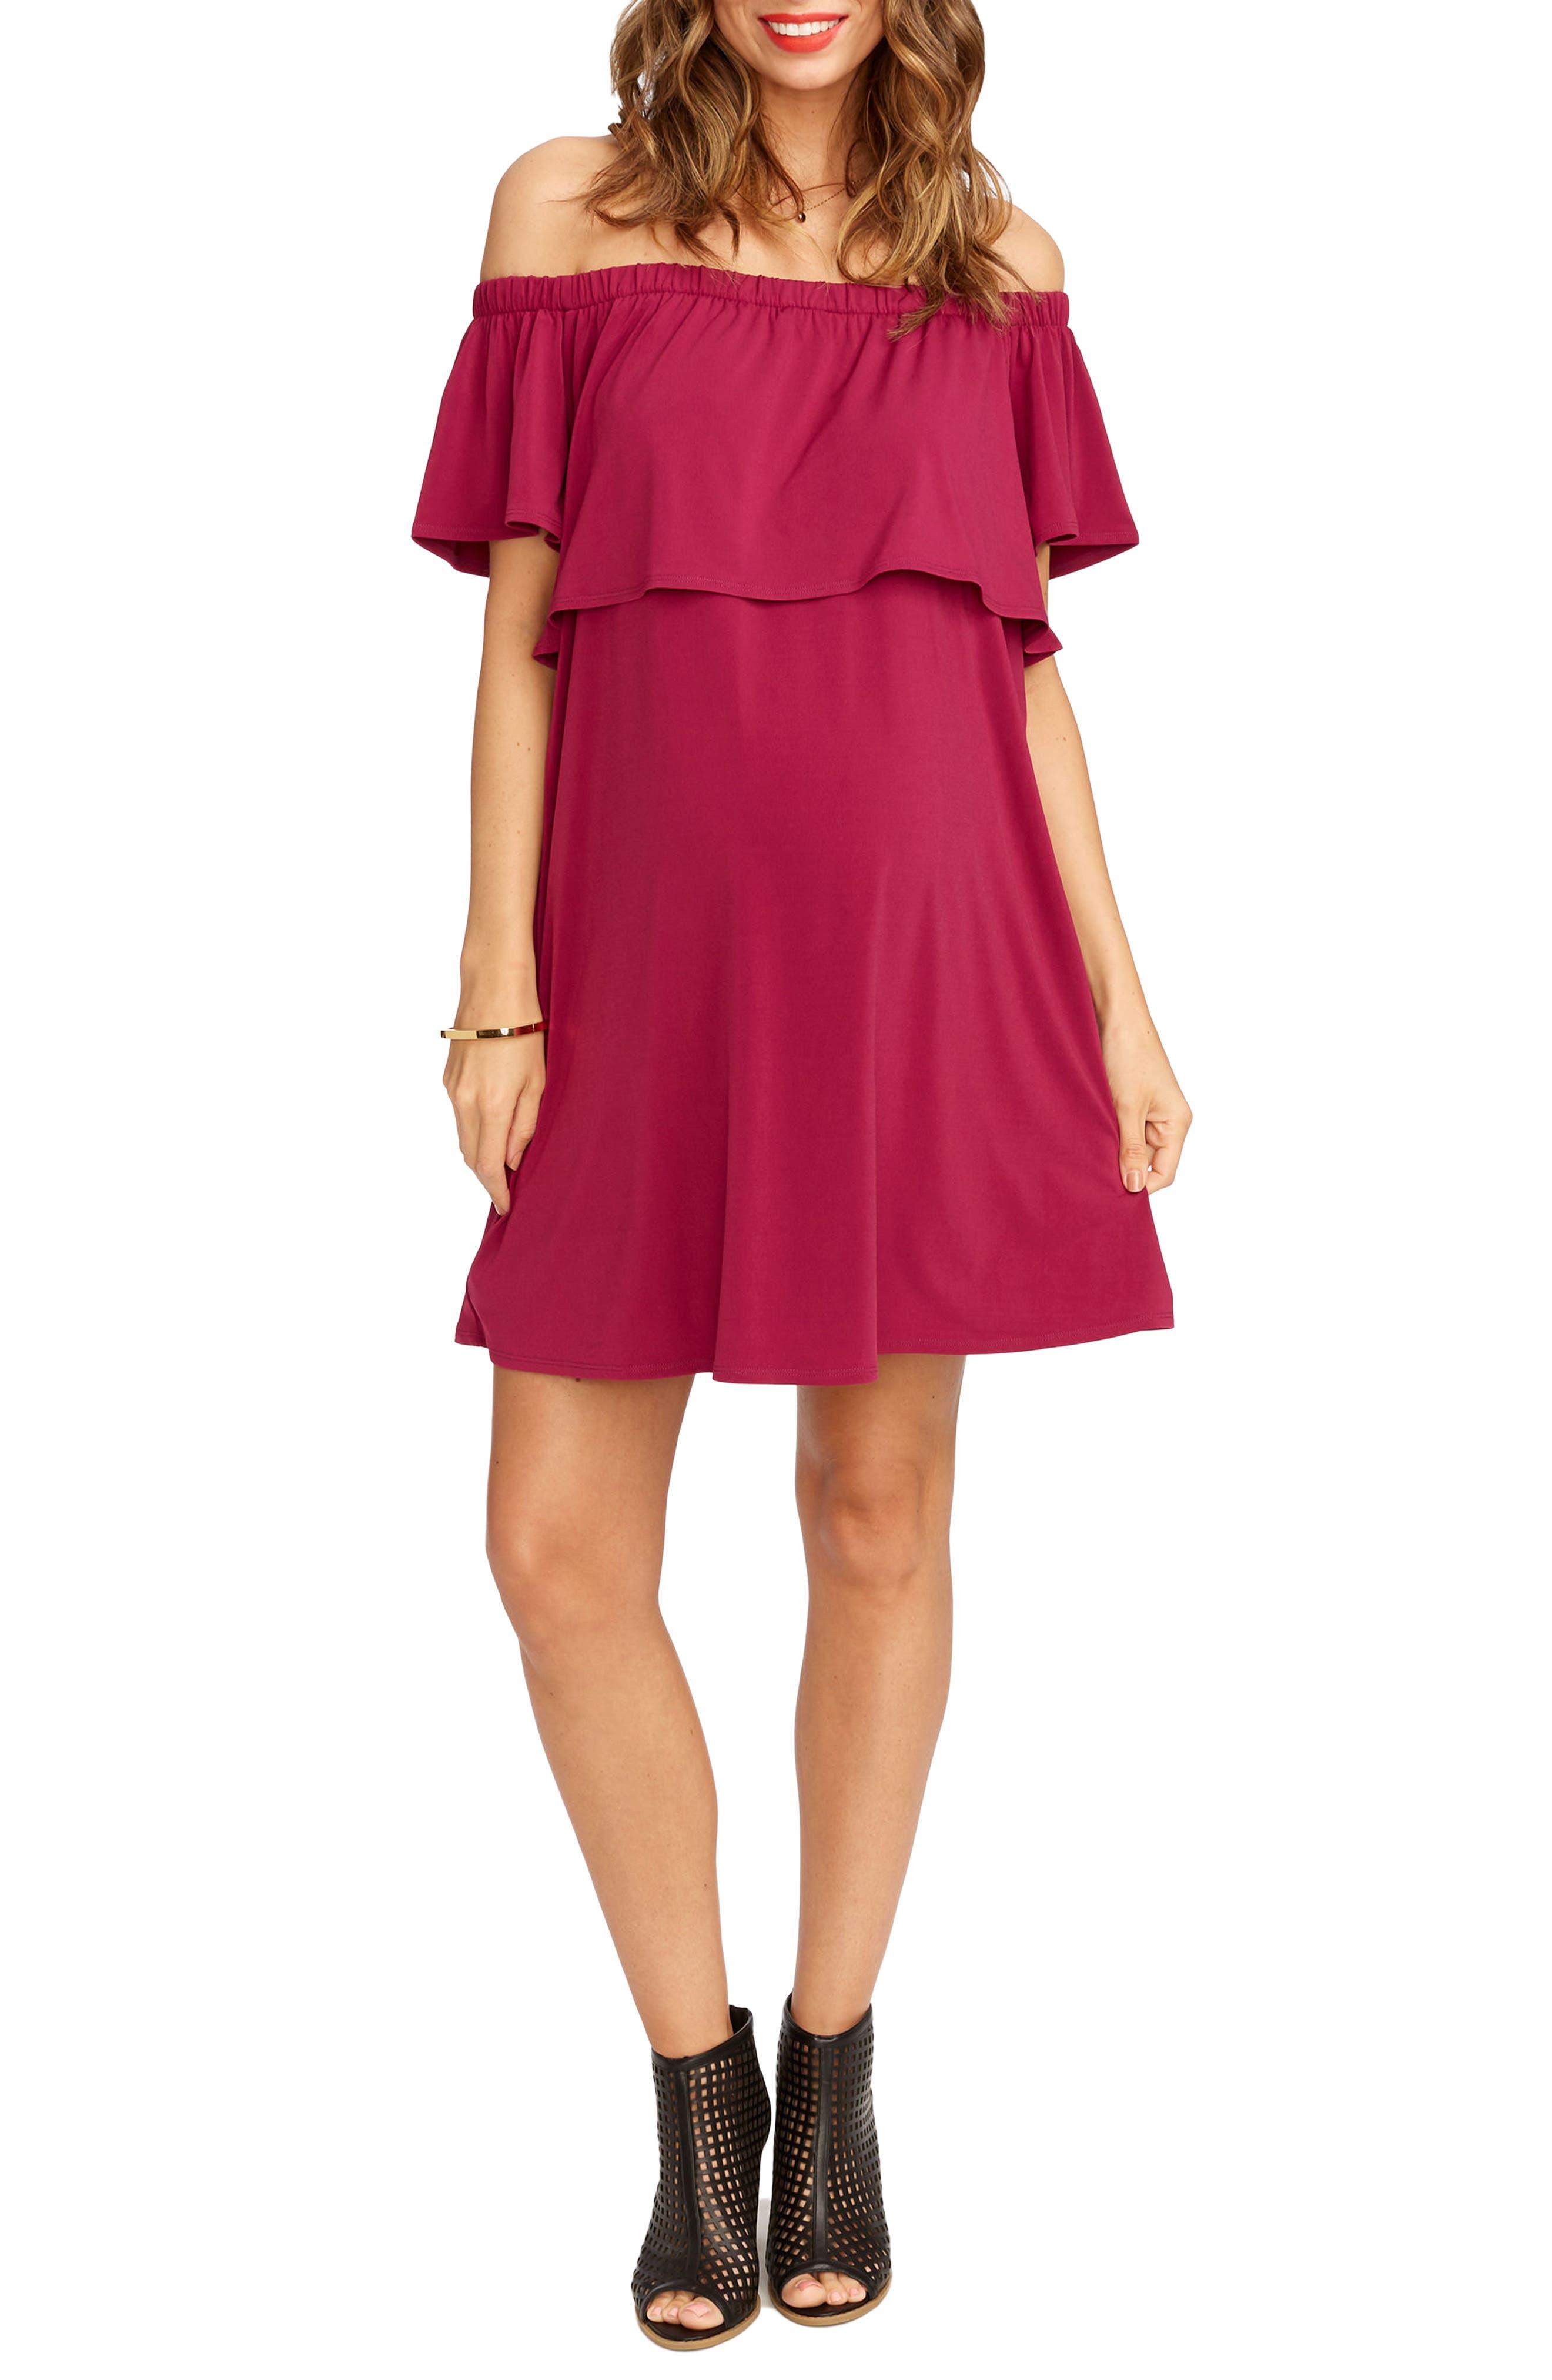 Rosie Pope Luisa Off The Shoulder Maternity Dress, Purple